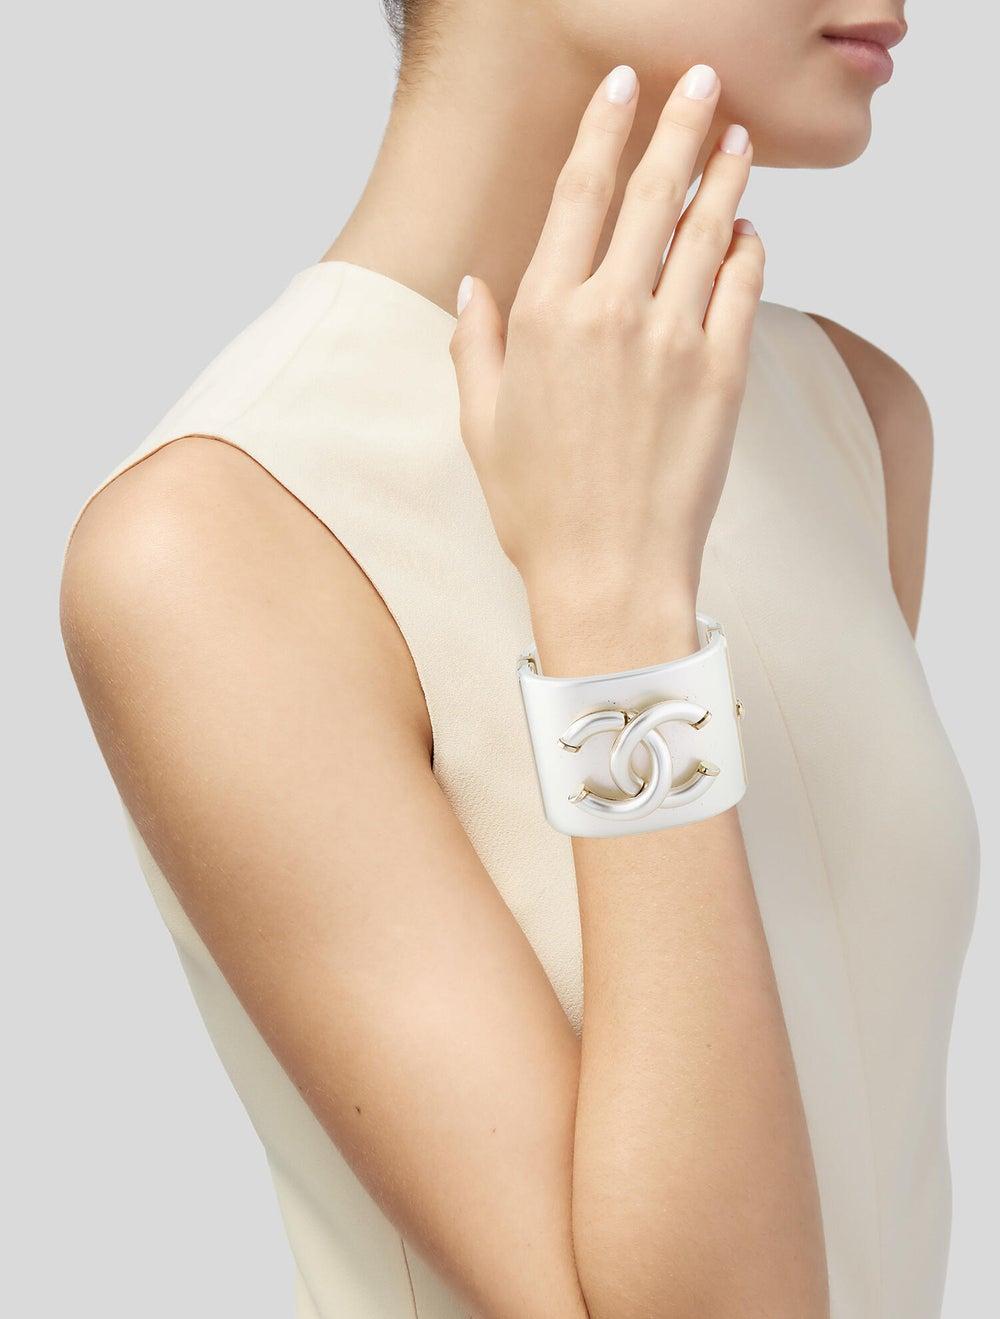 Chanel Resin CC Bracelet Gold - image 2